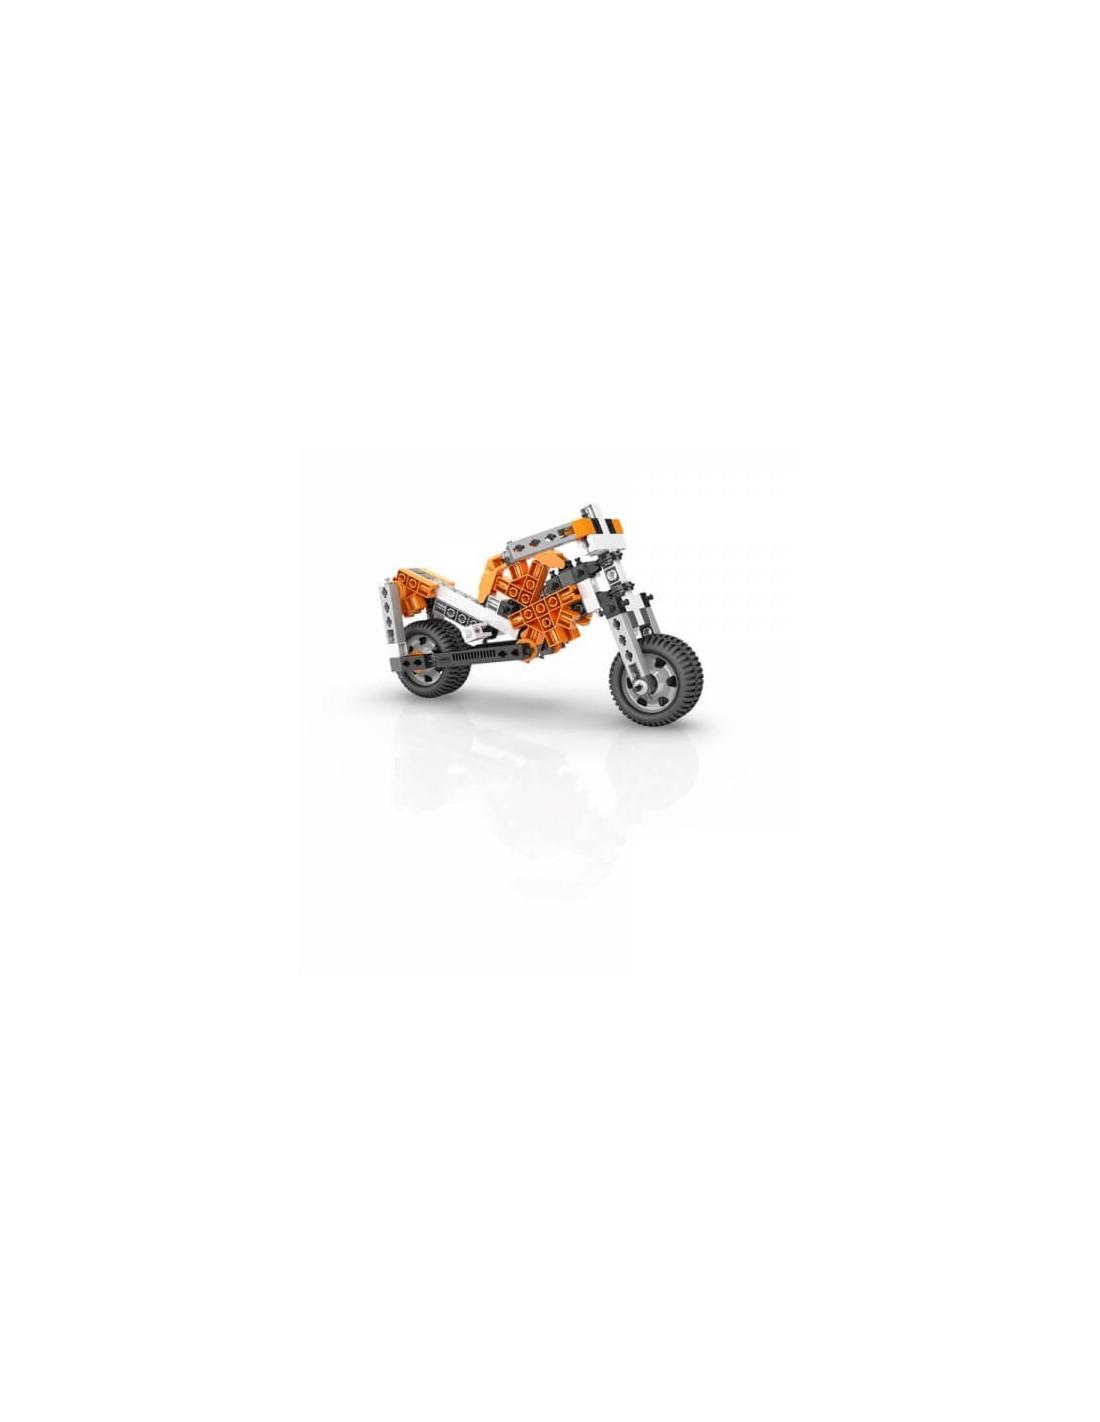 Set de constructie - STEM Wheels, Axles and Inclined Planes | Engino - 4